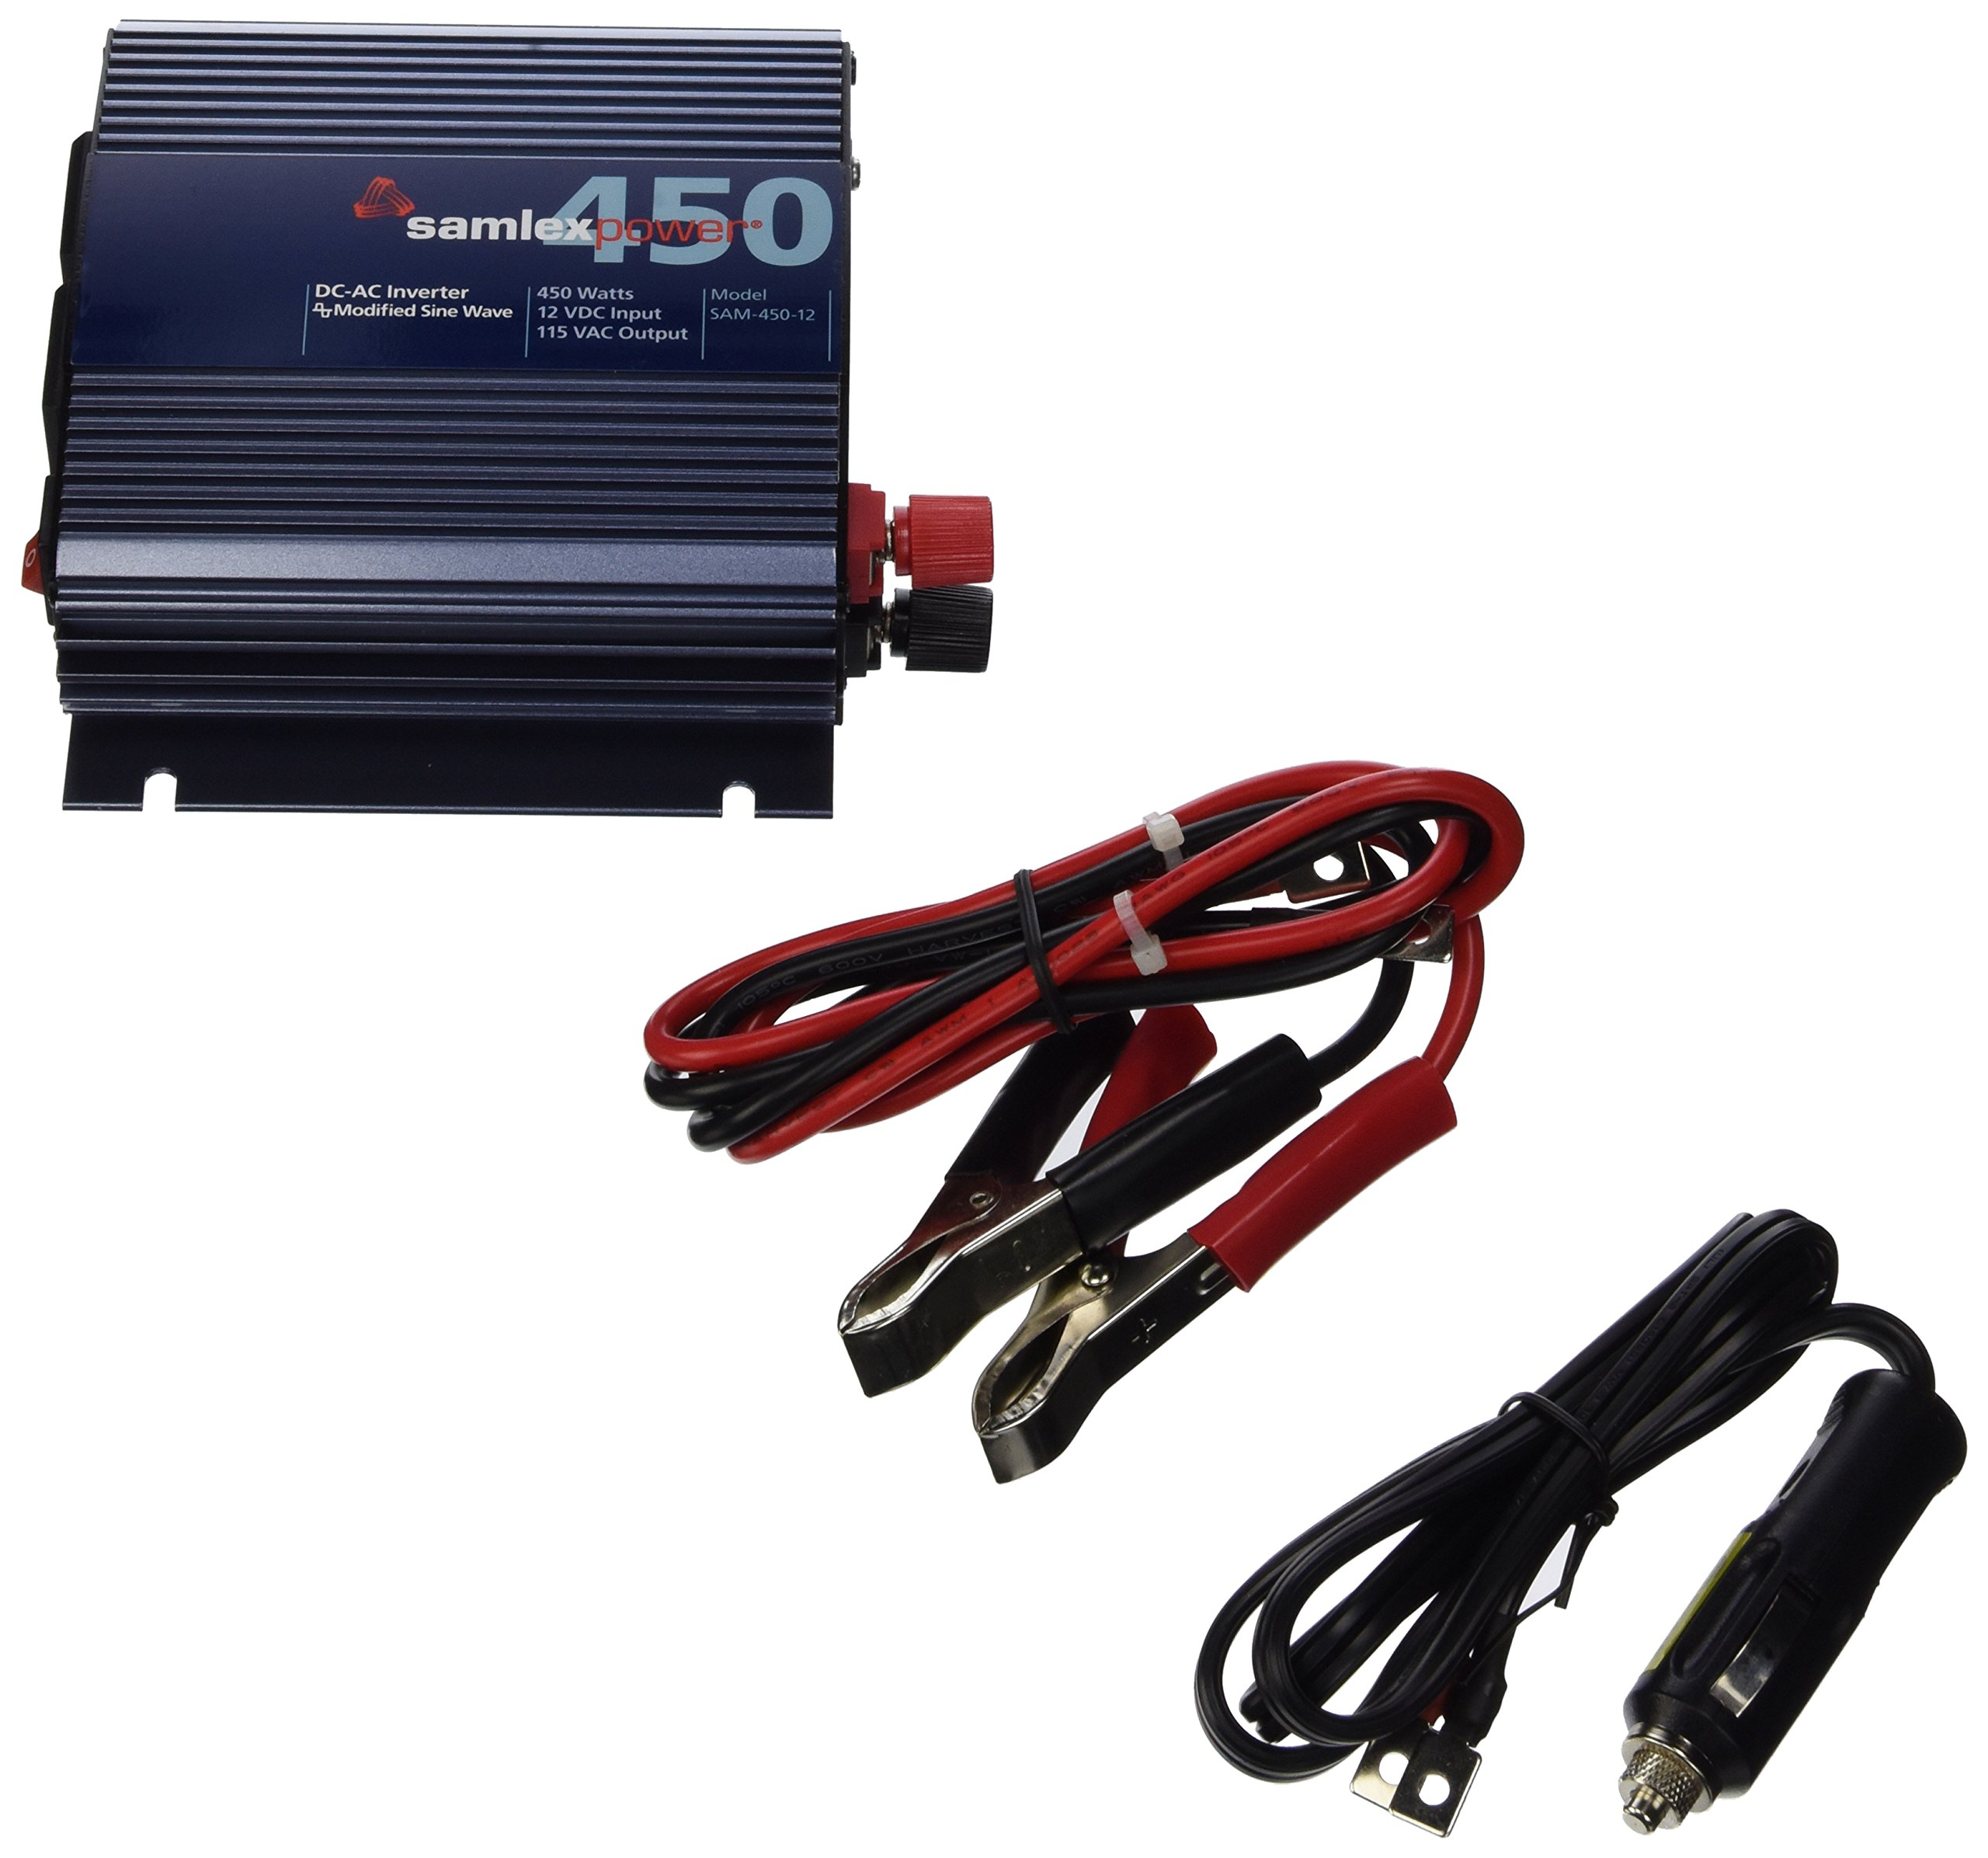 Samlex Solar SAM-450-12 SAM Series Modified Sine Wave Inverter by Samlex America (Image #1)